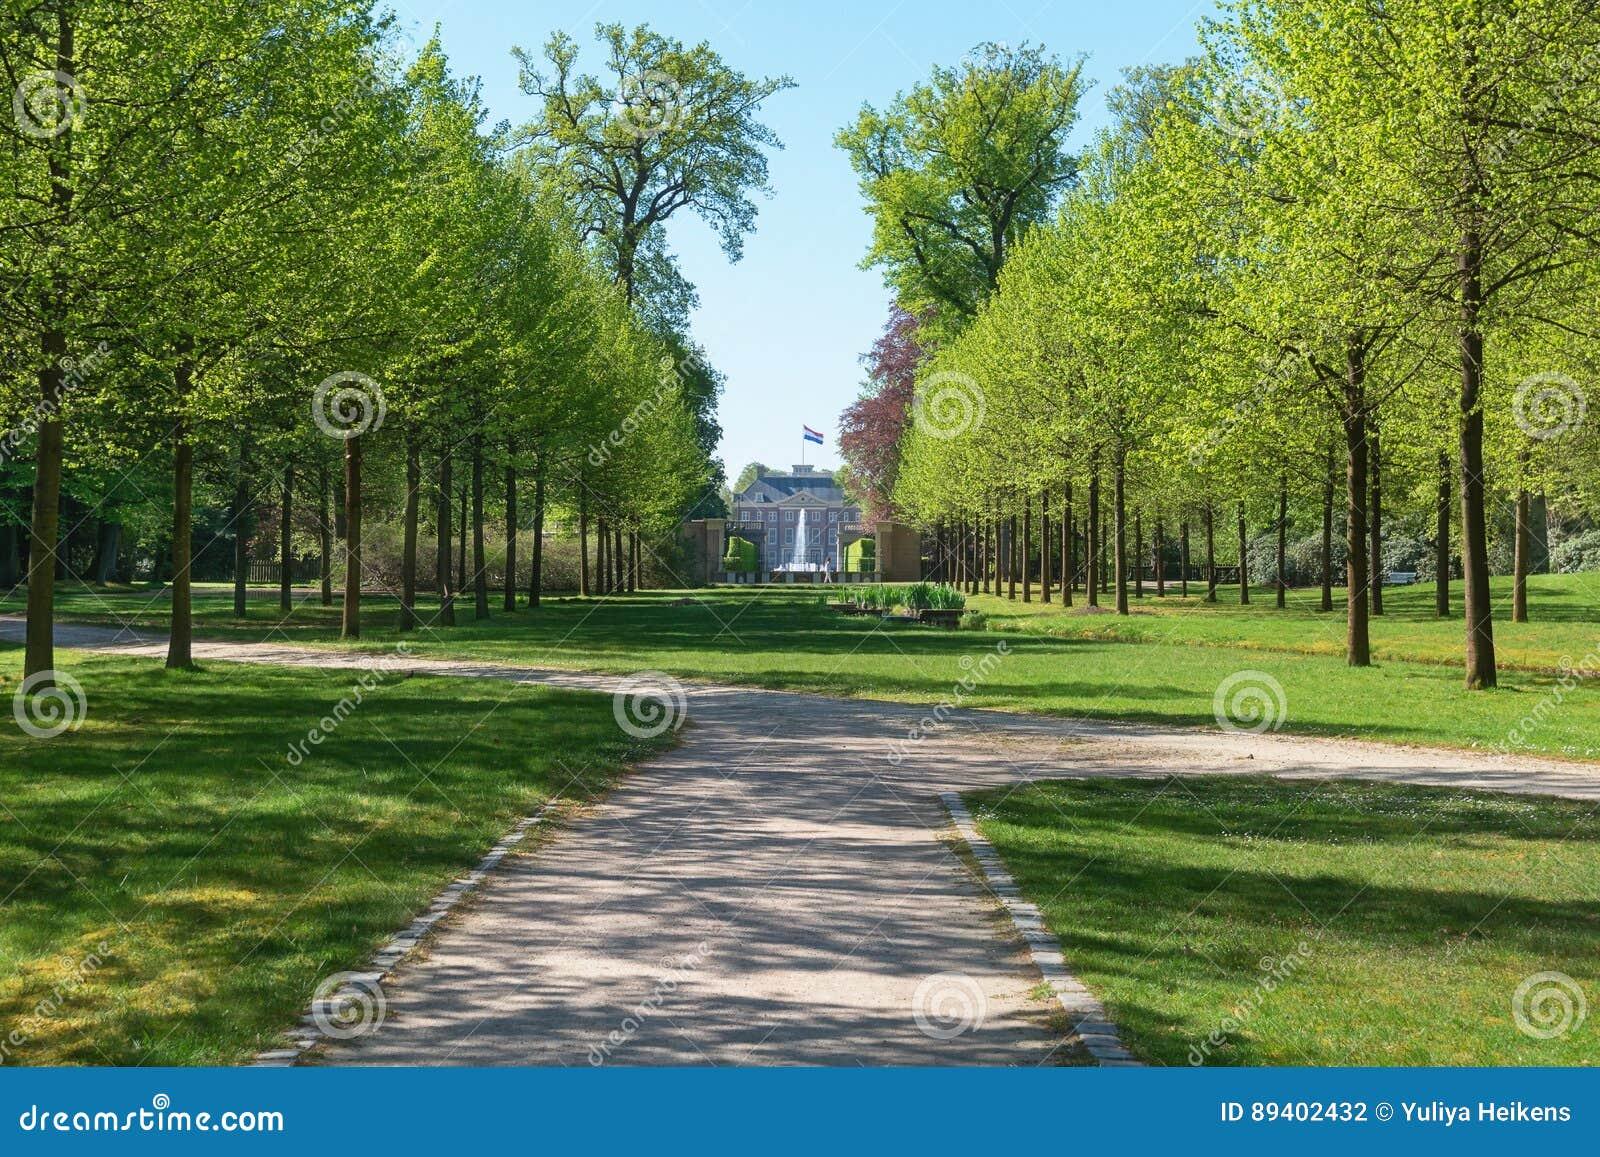 Parque atrás de Loo Palace